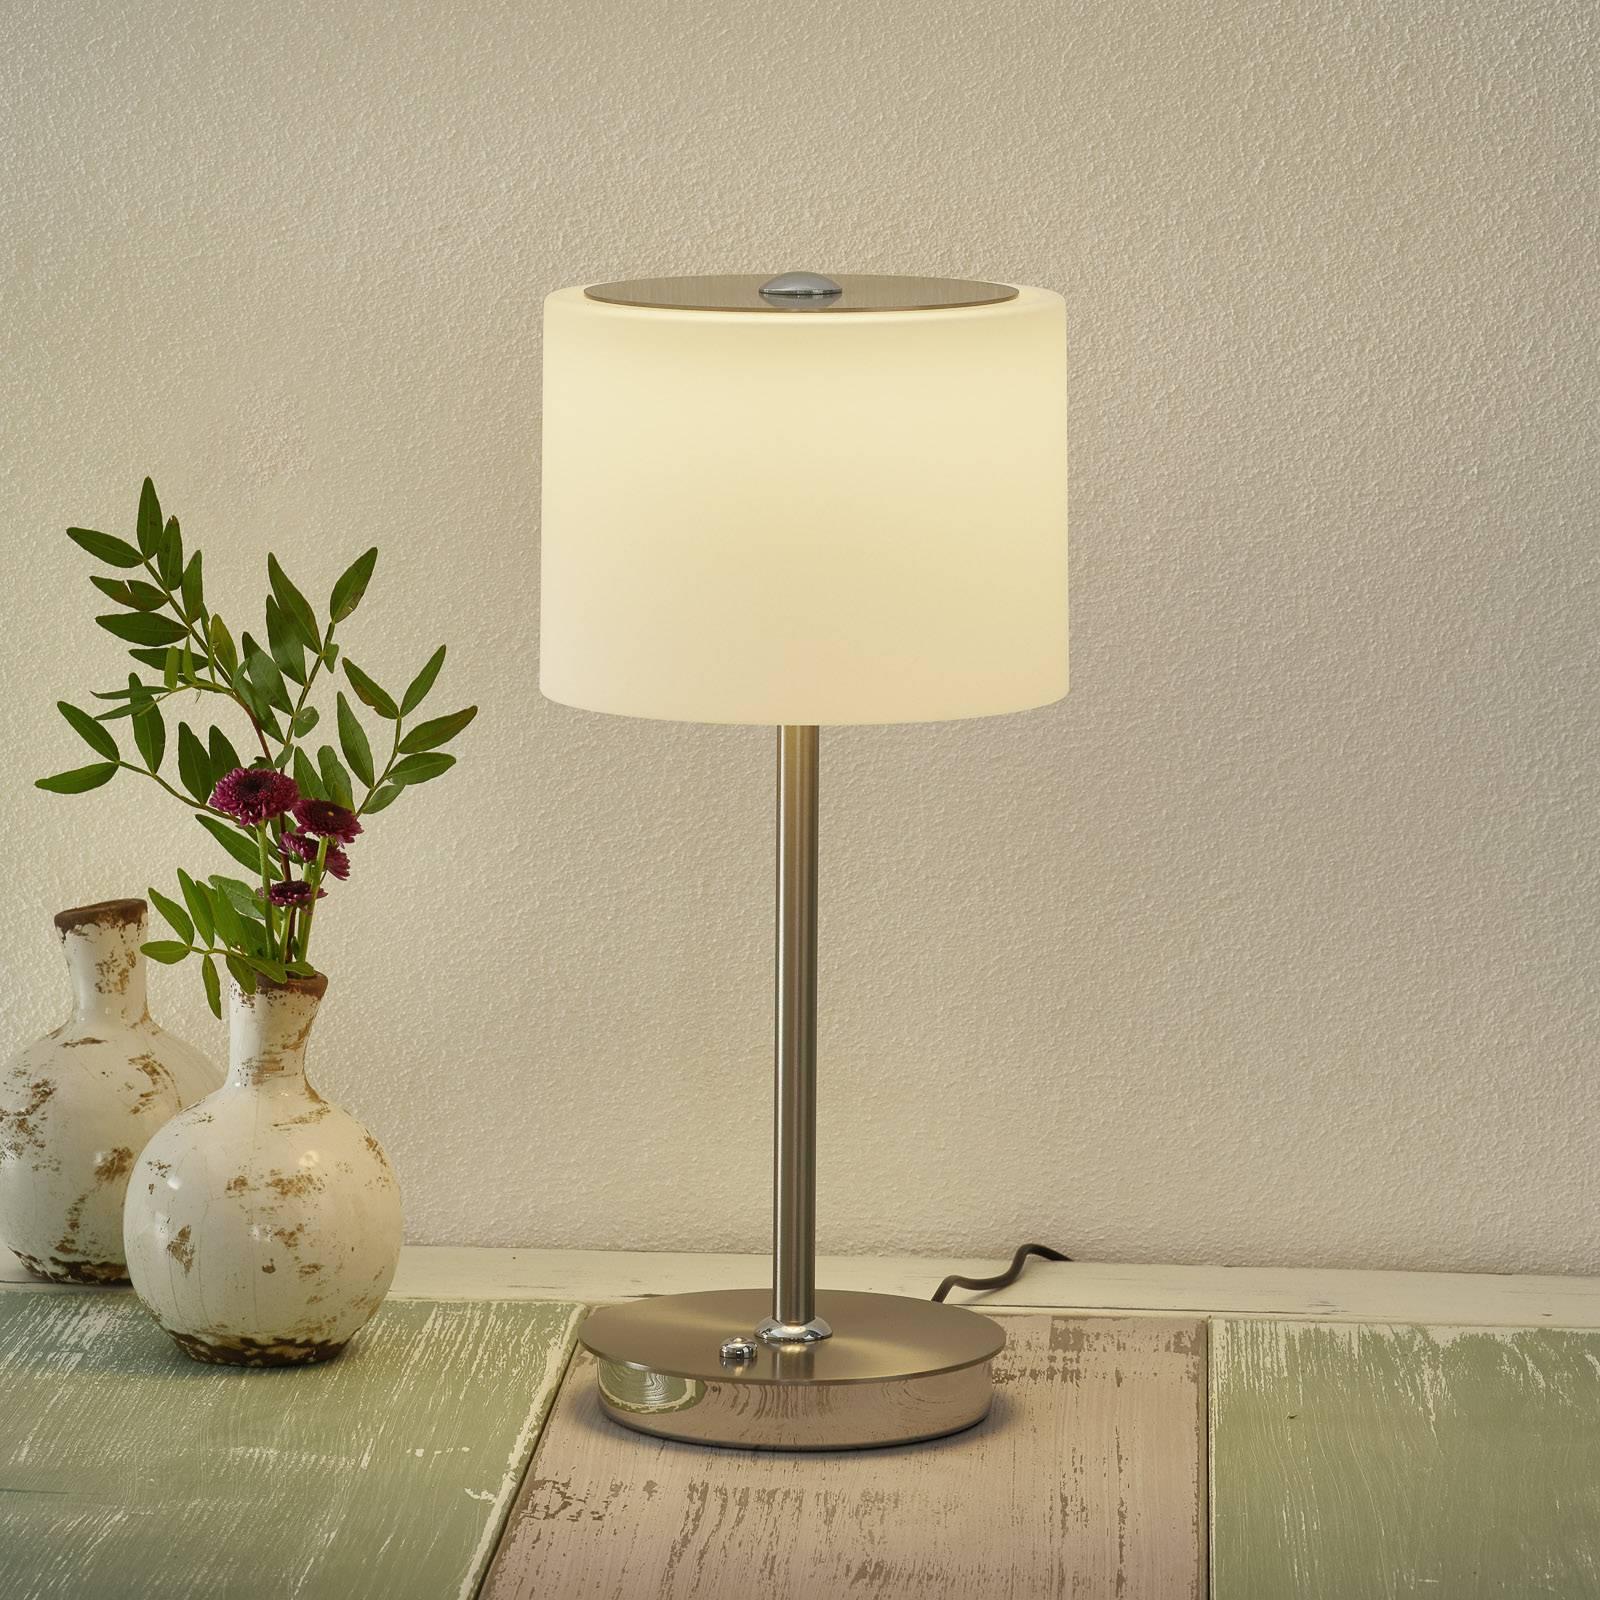 BANKAMP Grazia lampe à poser LED ZigBee